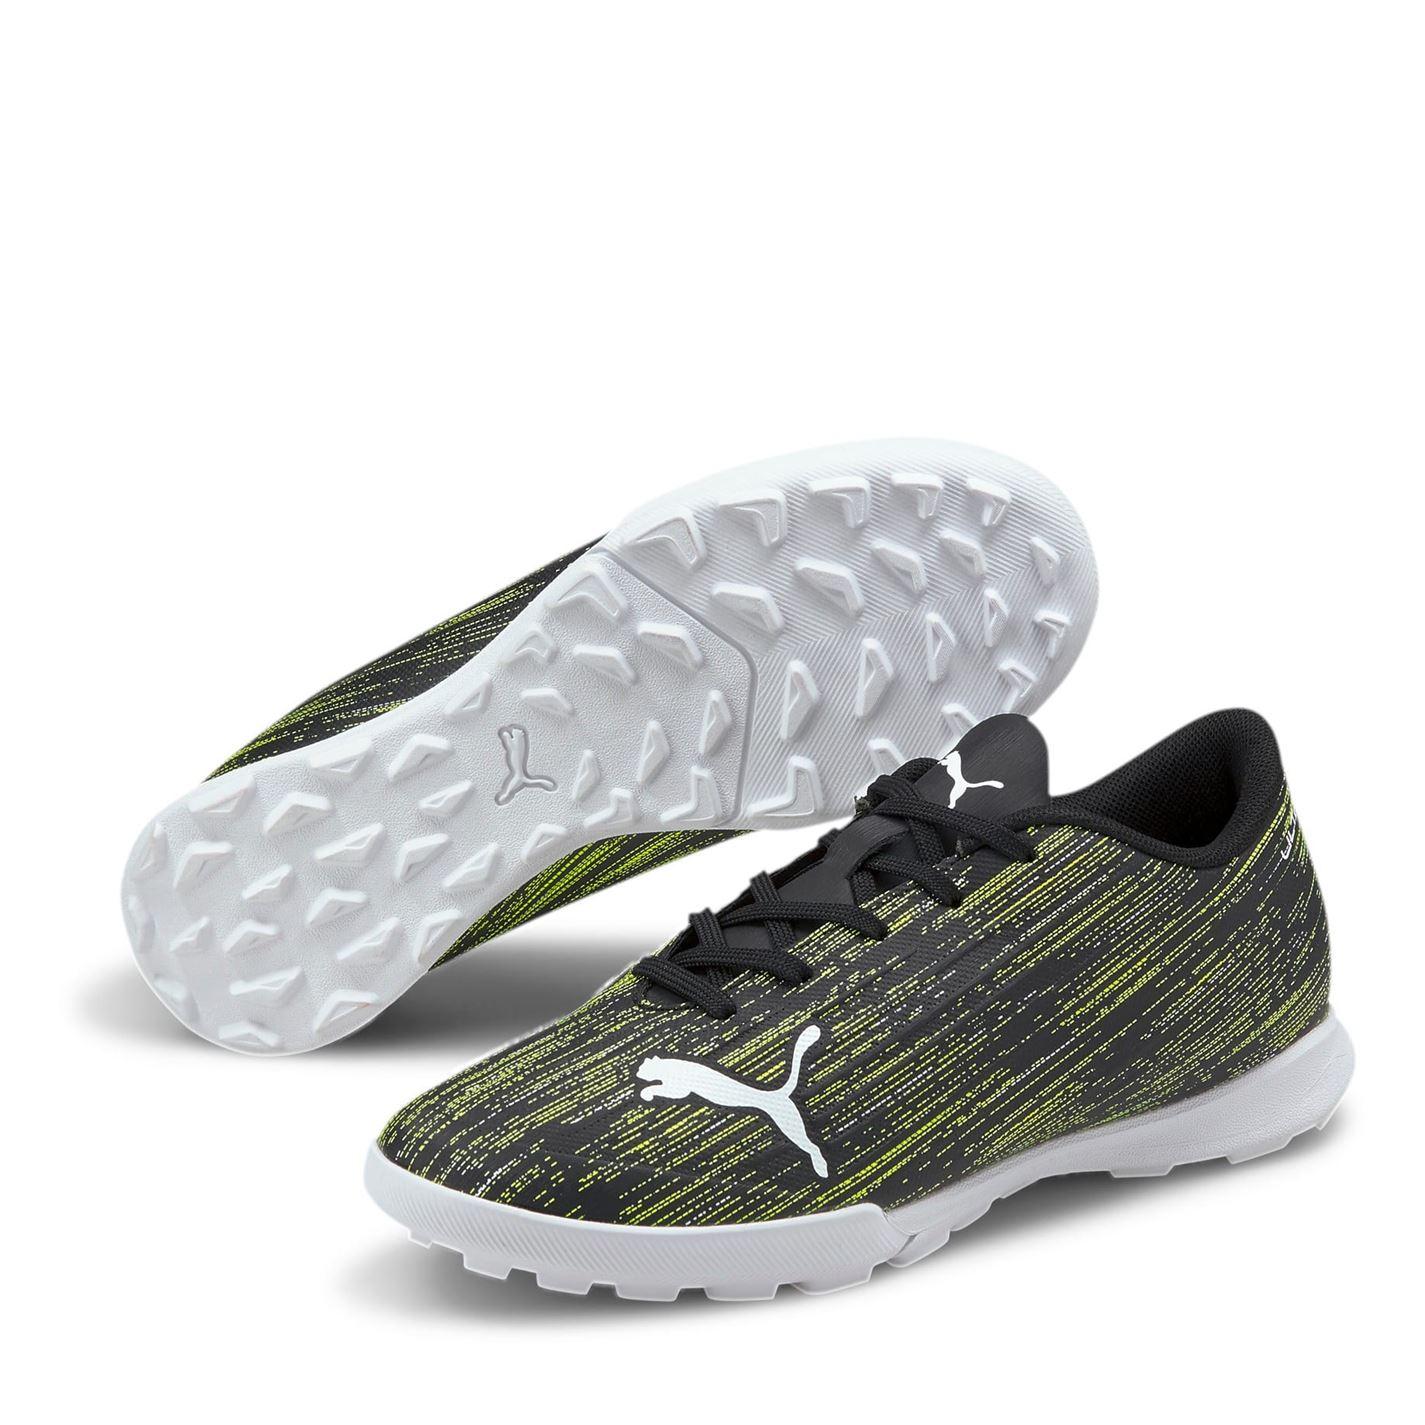 Mergi la Adidasi Gazon Sintetic Puma Ultra 4.2 pentru copii negru galben